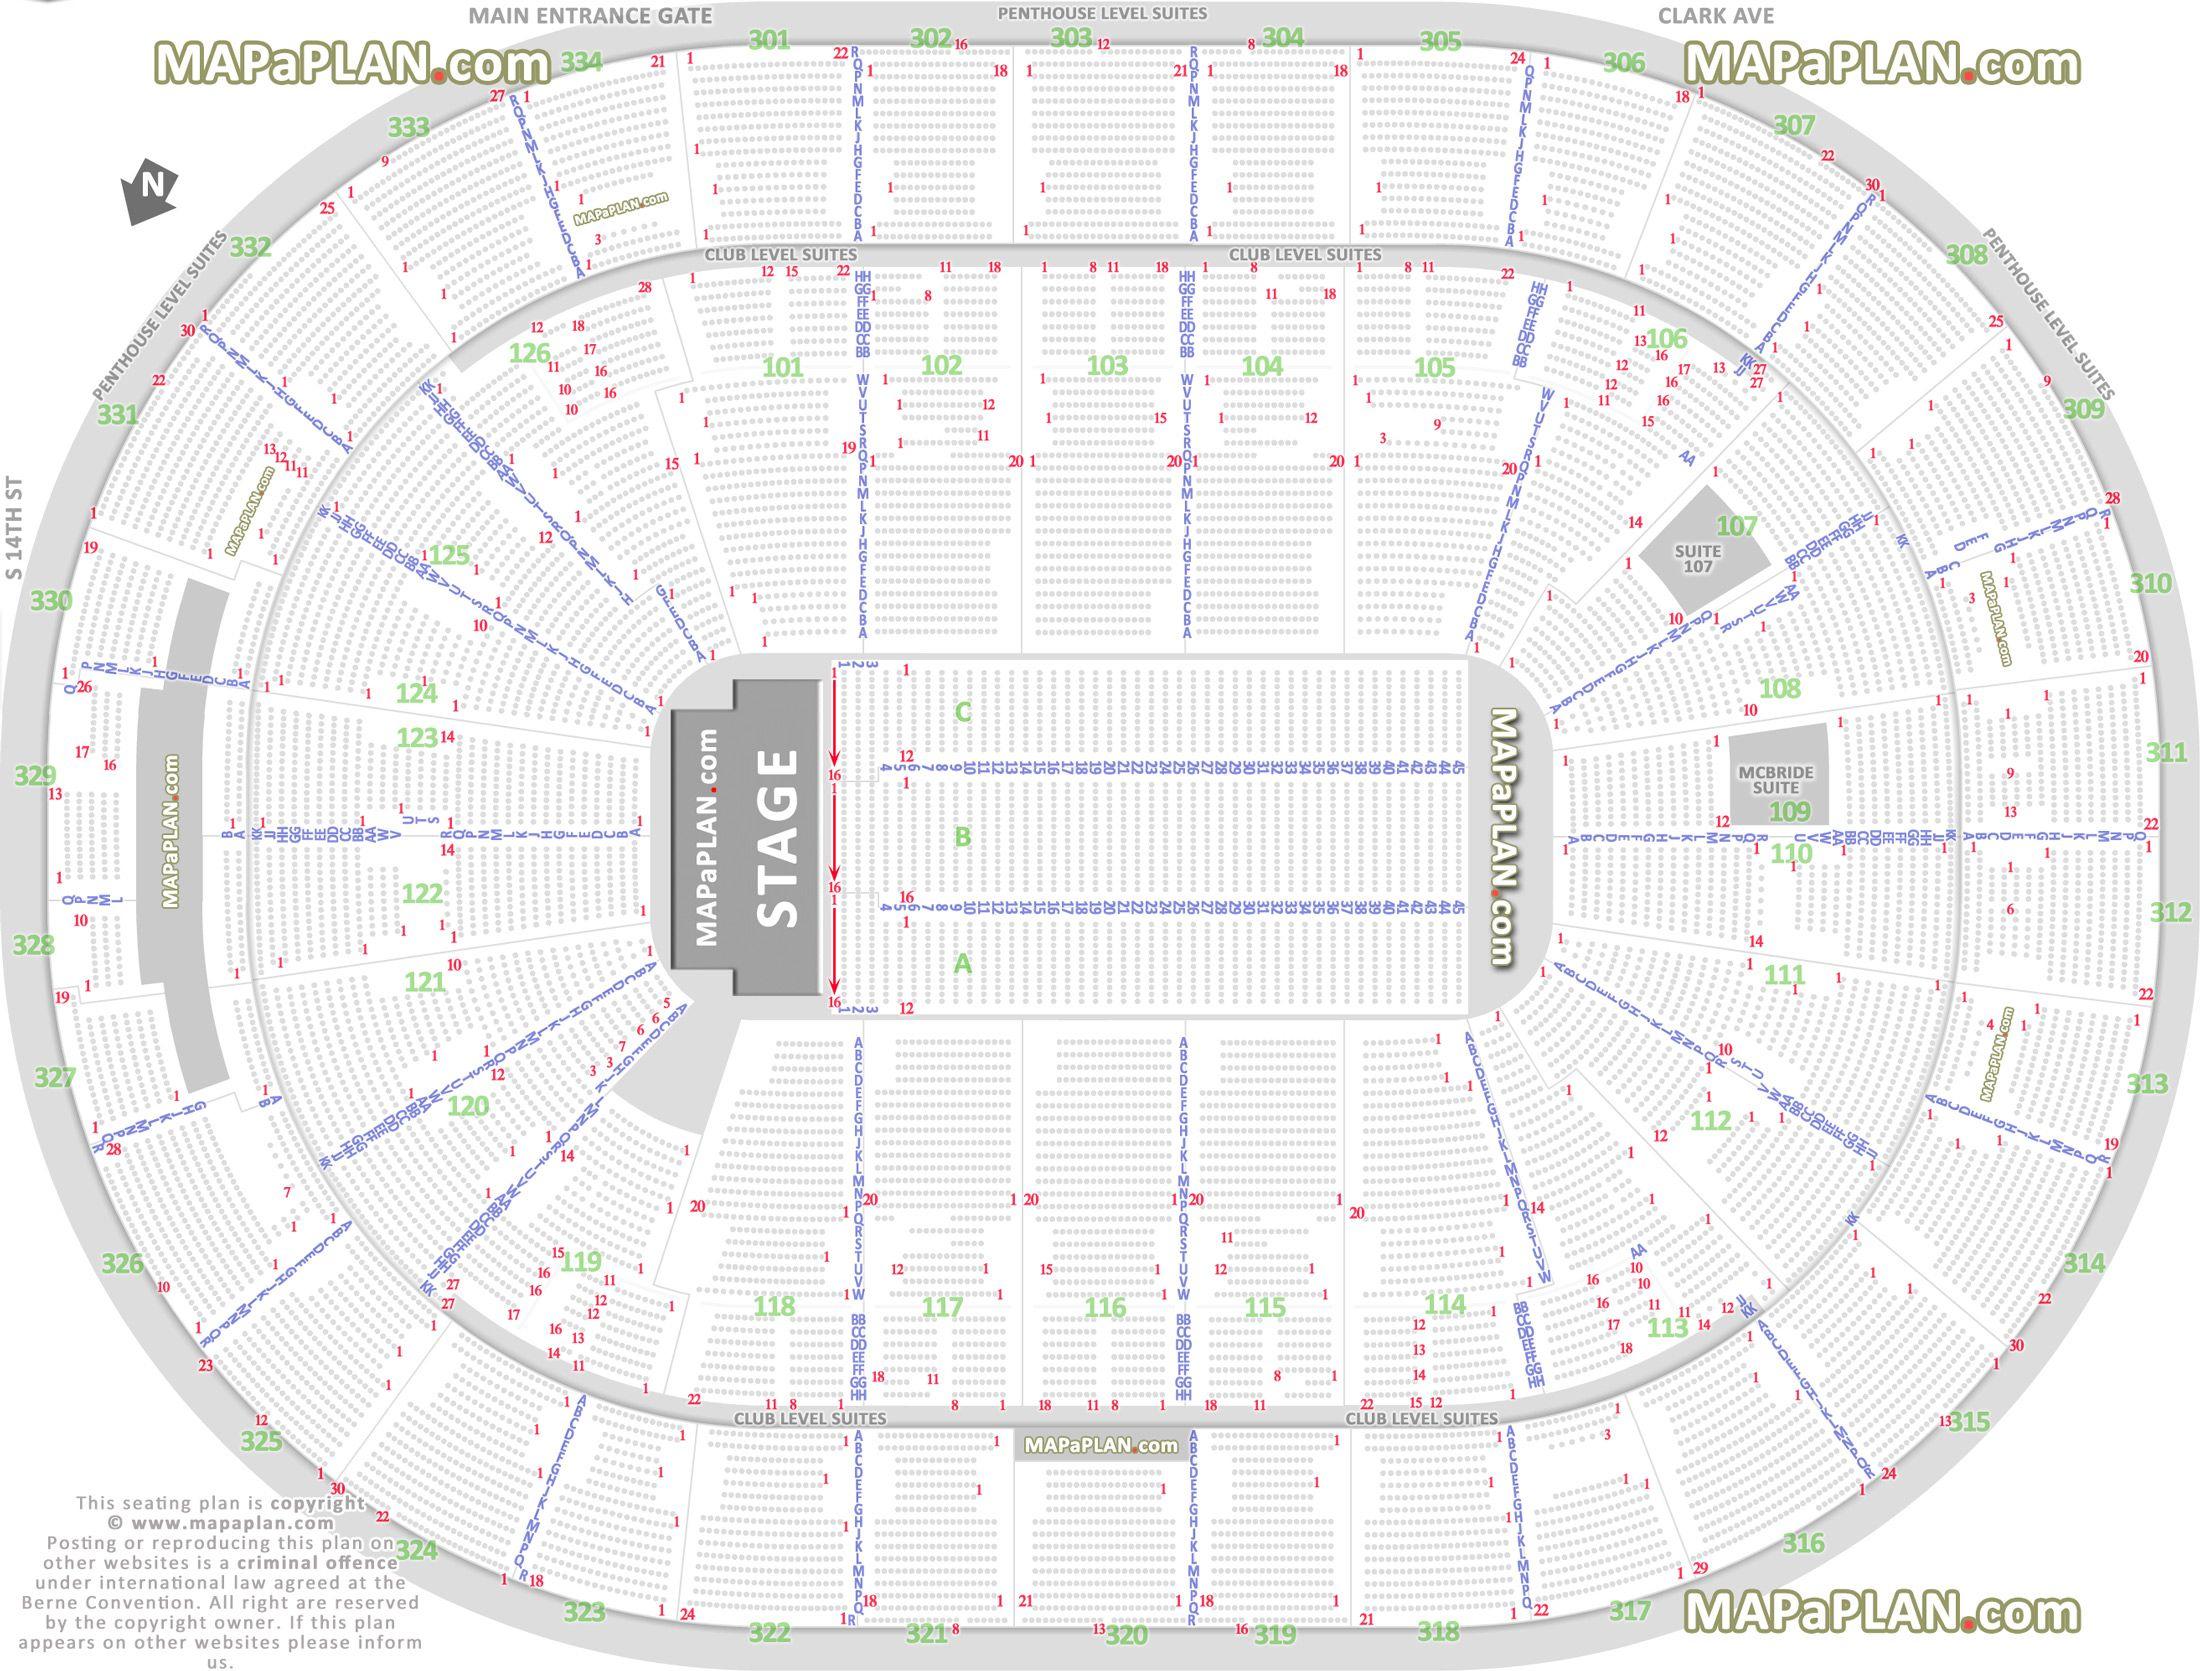 Scottrade Center Detailed Seating Chart Rows  Bobi inside Bok Center Seating Chart